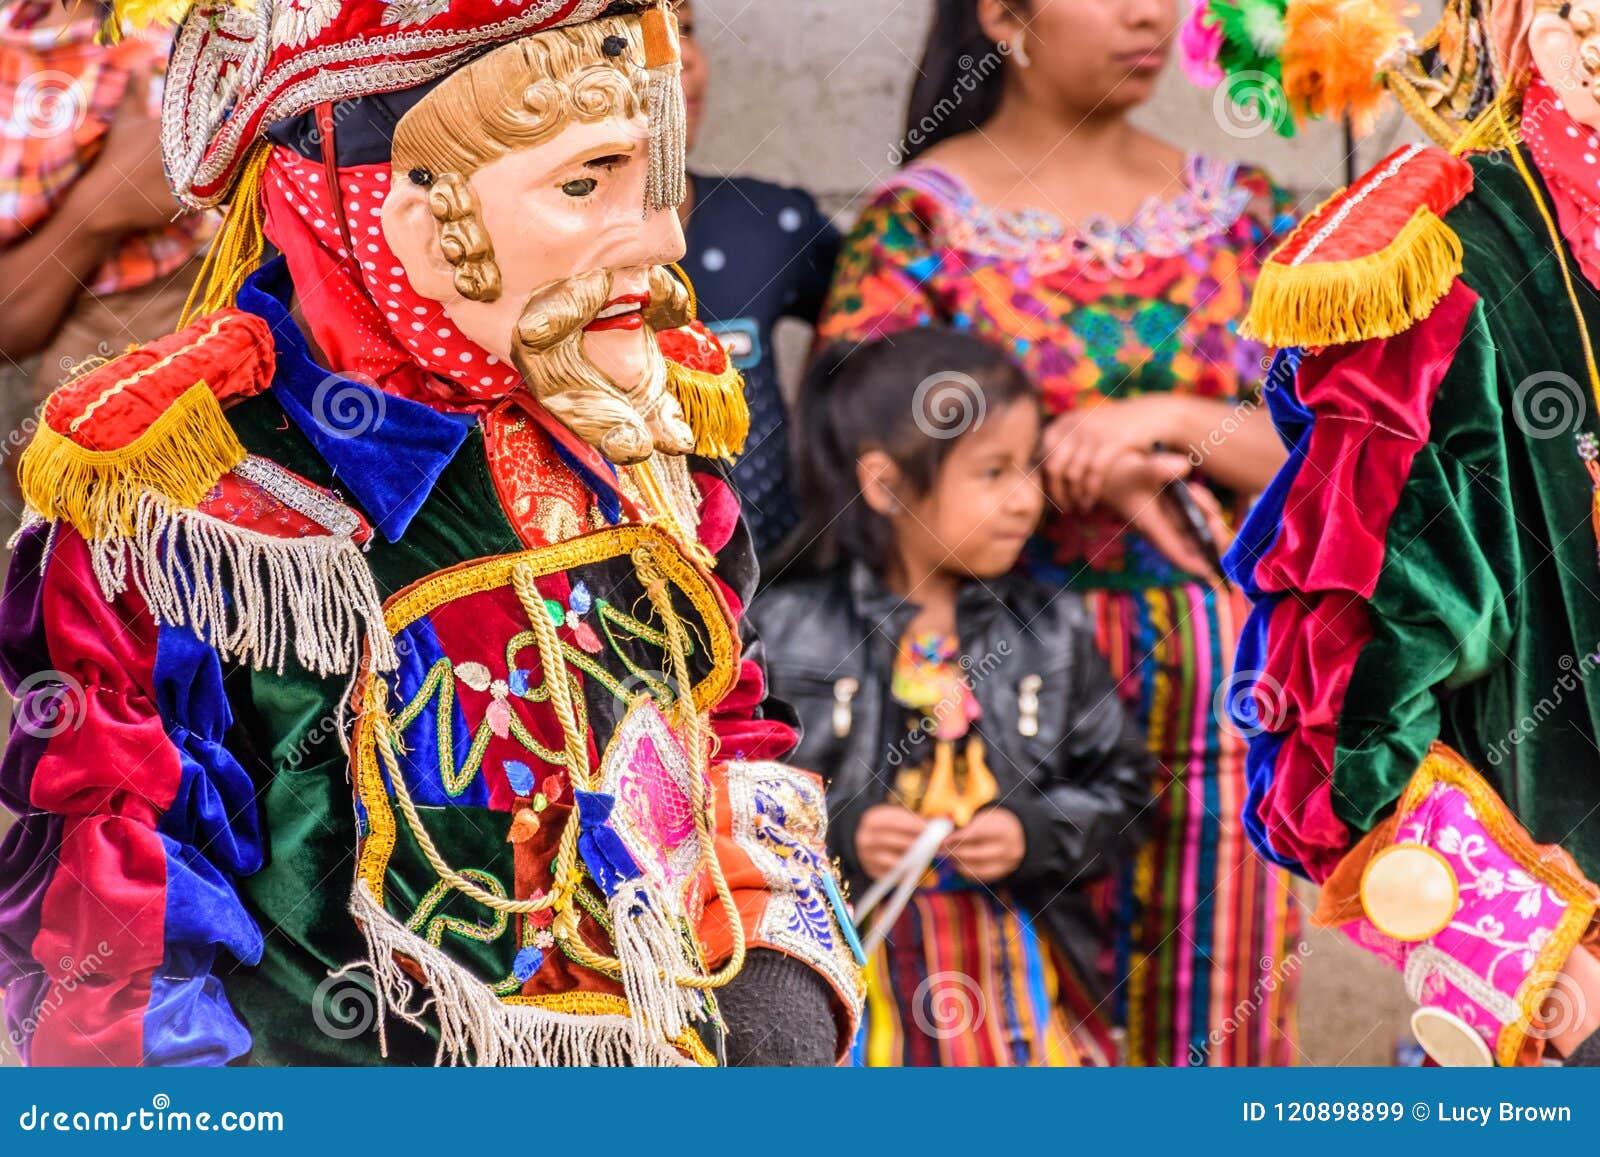 Traditional folk dancers in Spanish conquistador masks & costume